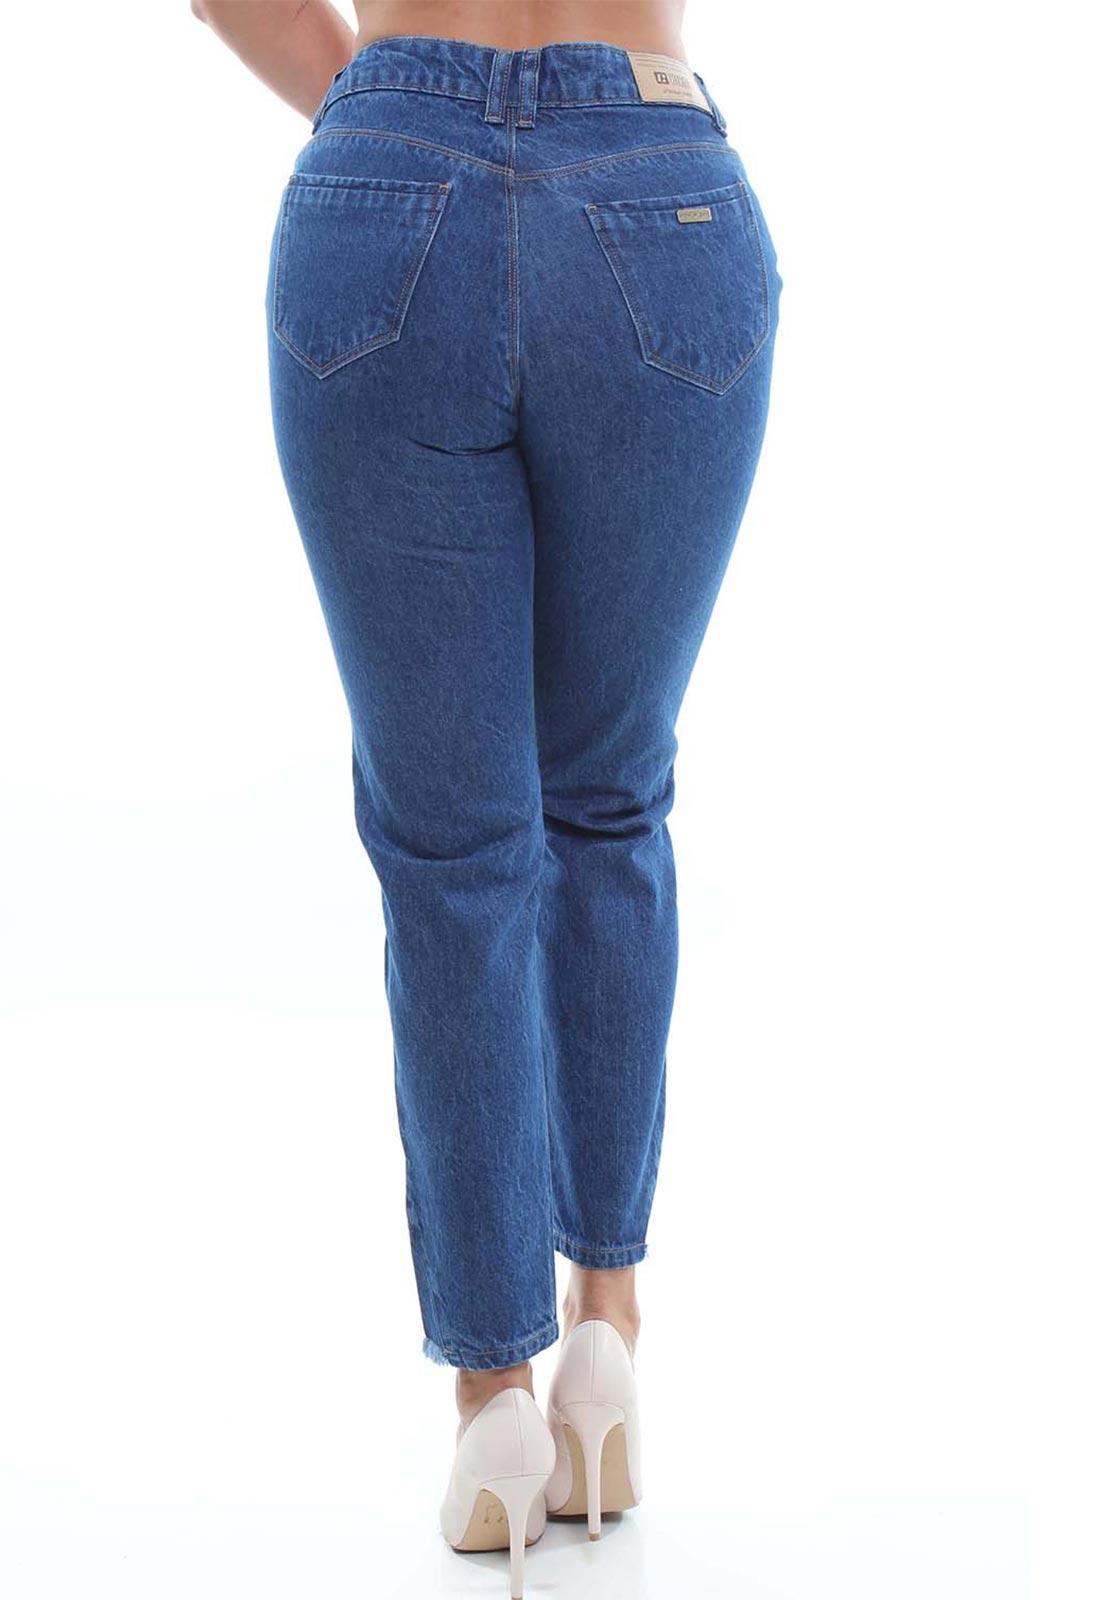 Calça Mom Fit Jeans Feminina Crocker - 48060  - CROCKER JEANS